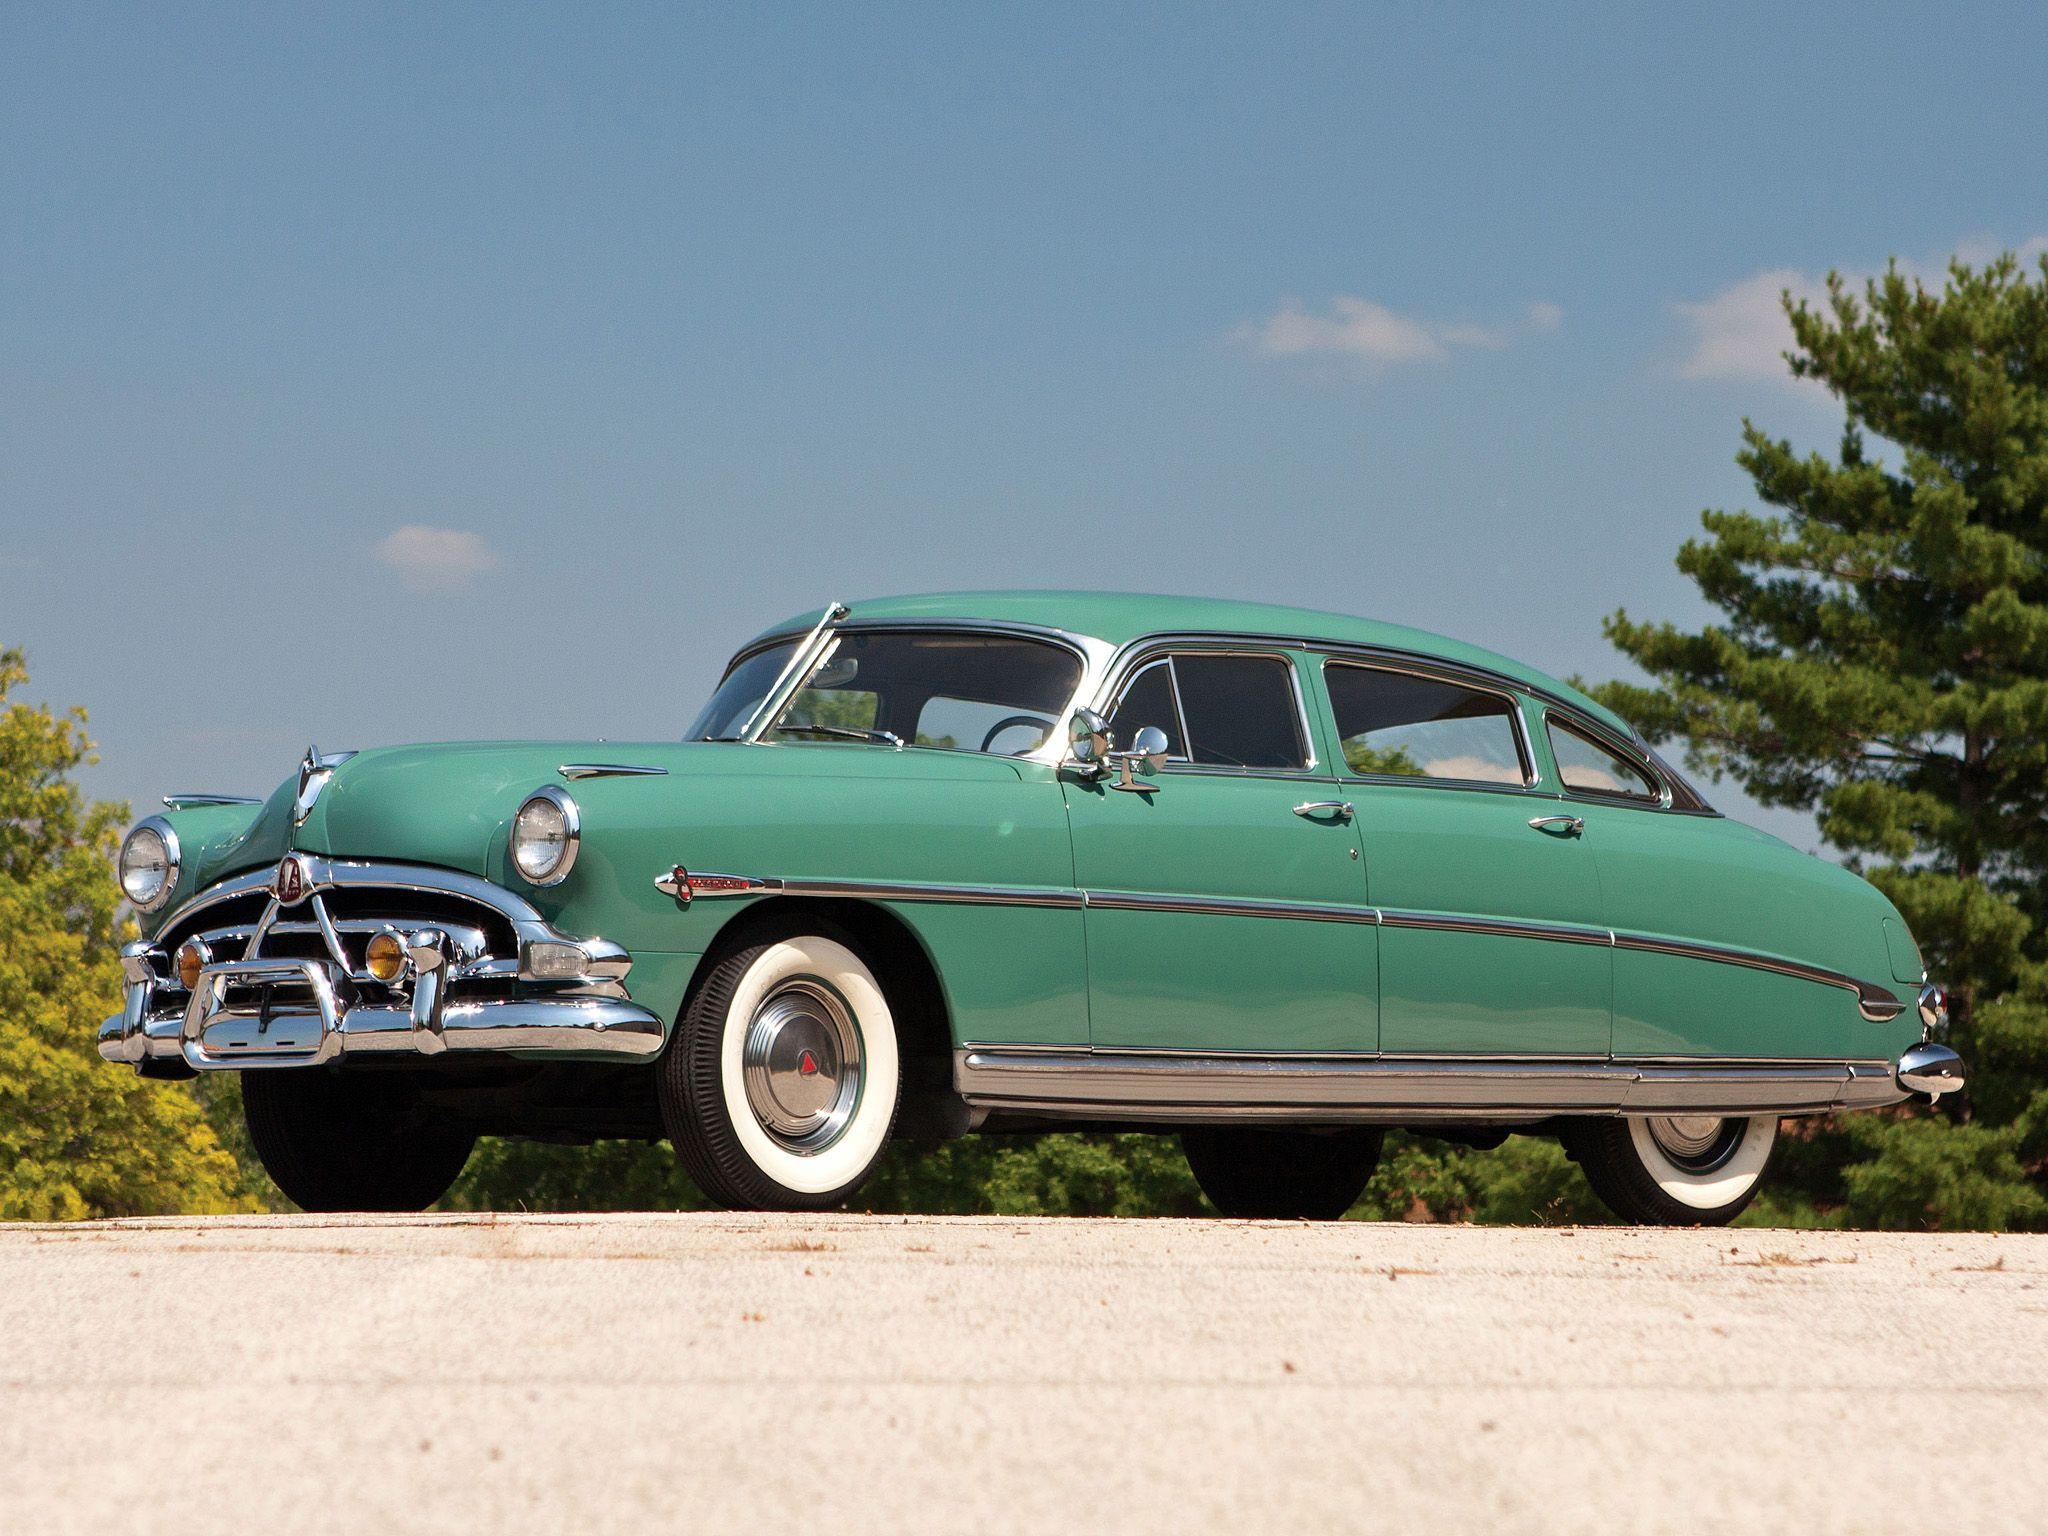 1952 hudson commodore 8 sedan classic automobiles hudson rh pinterest com